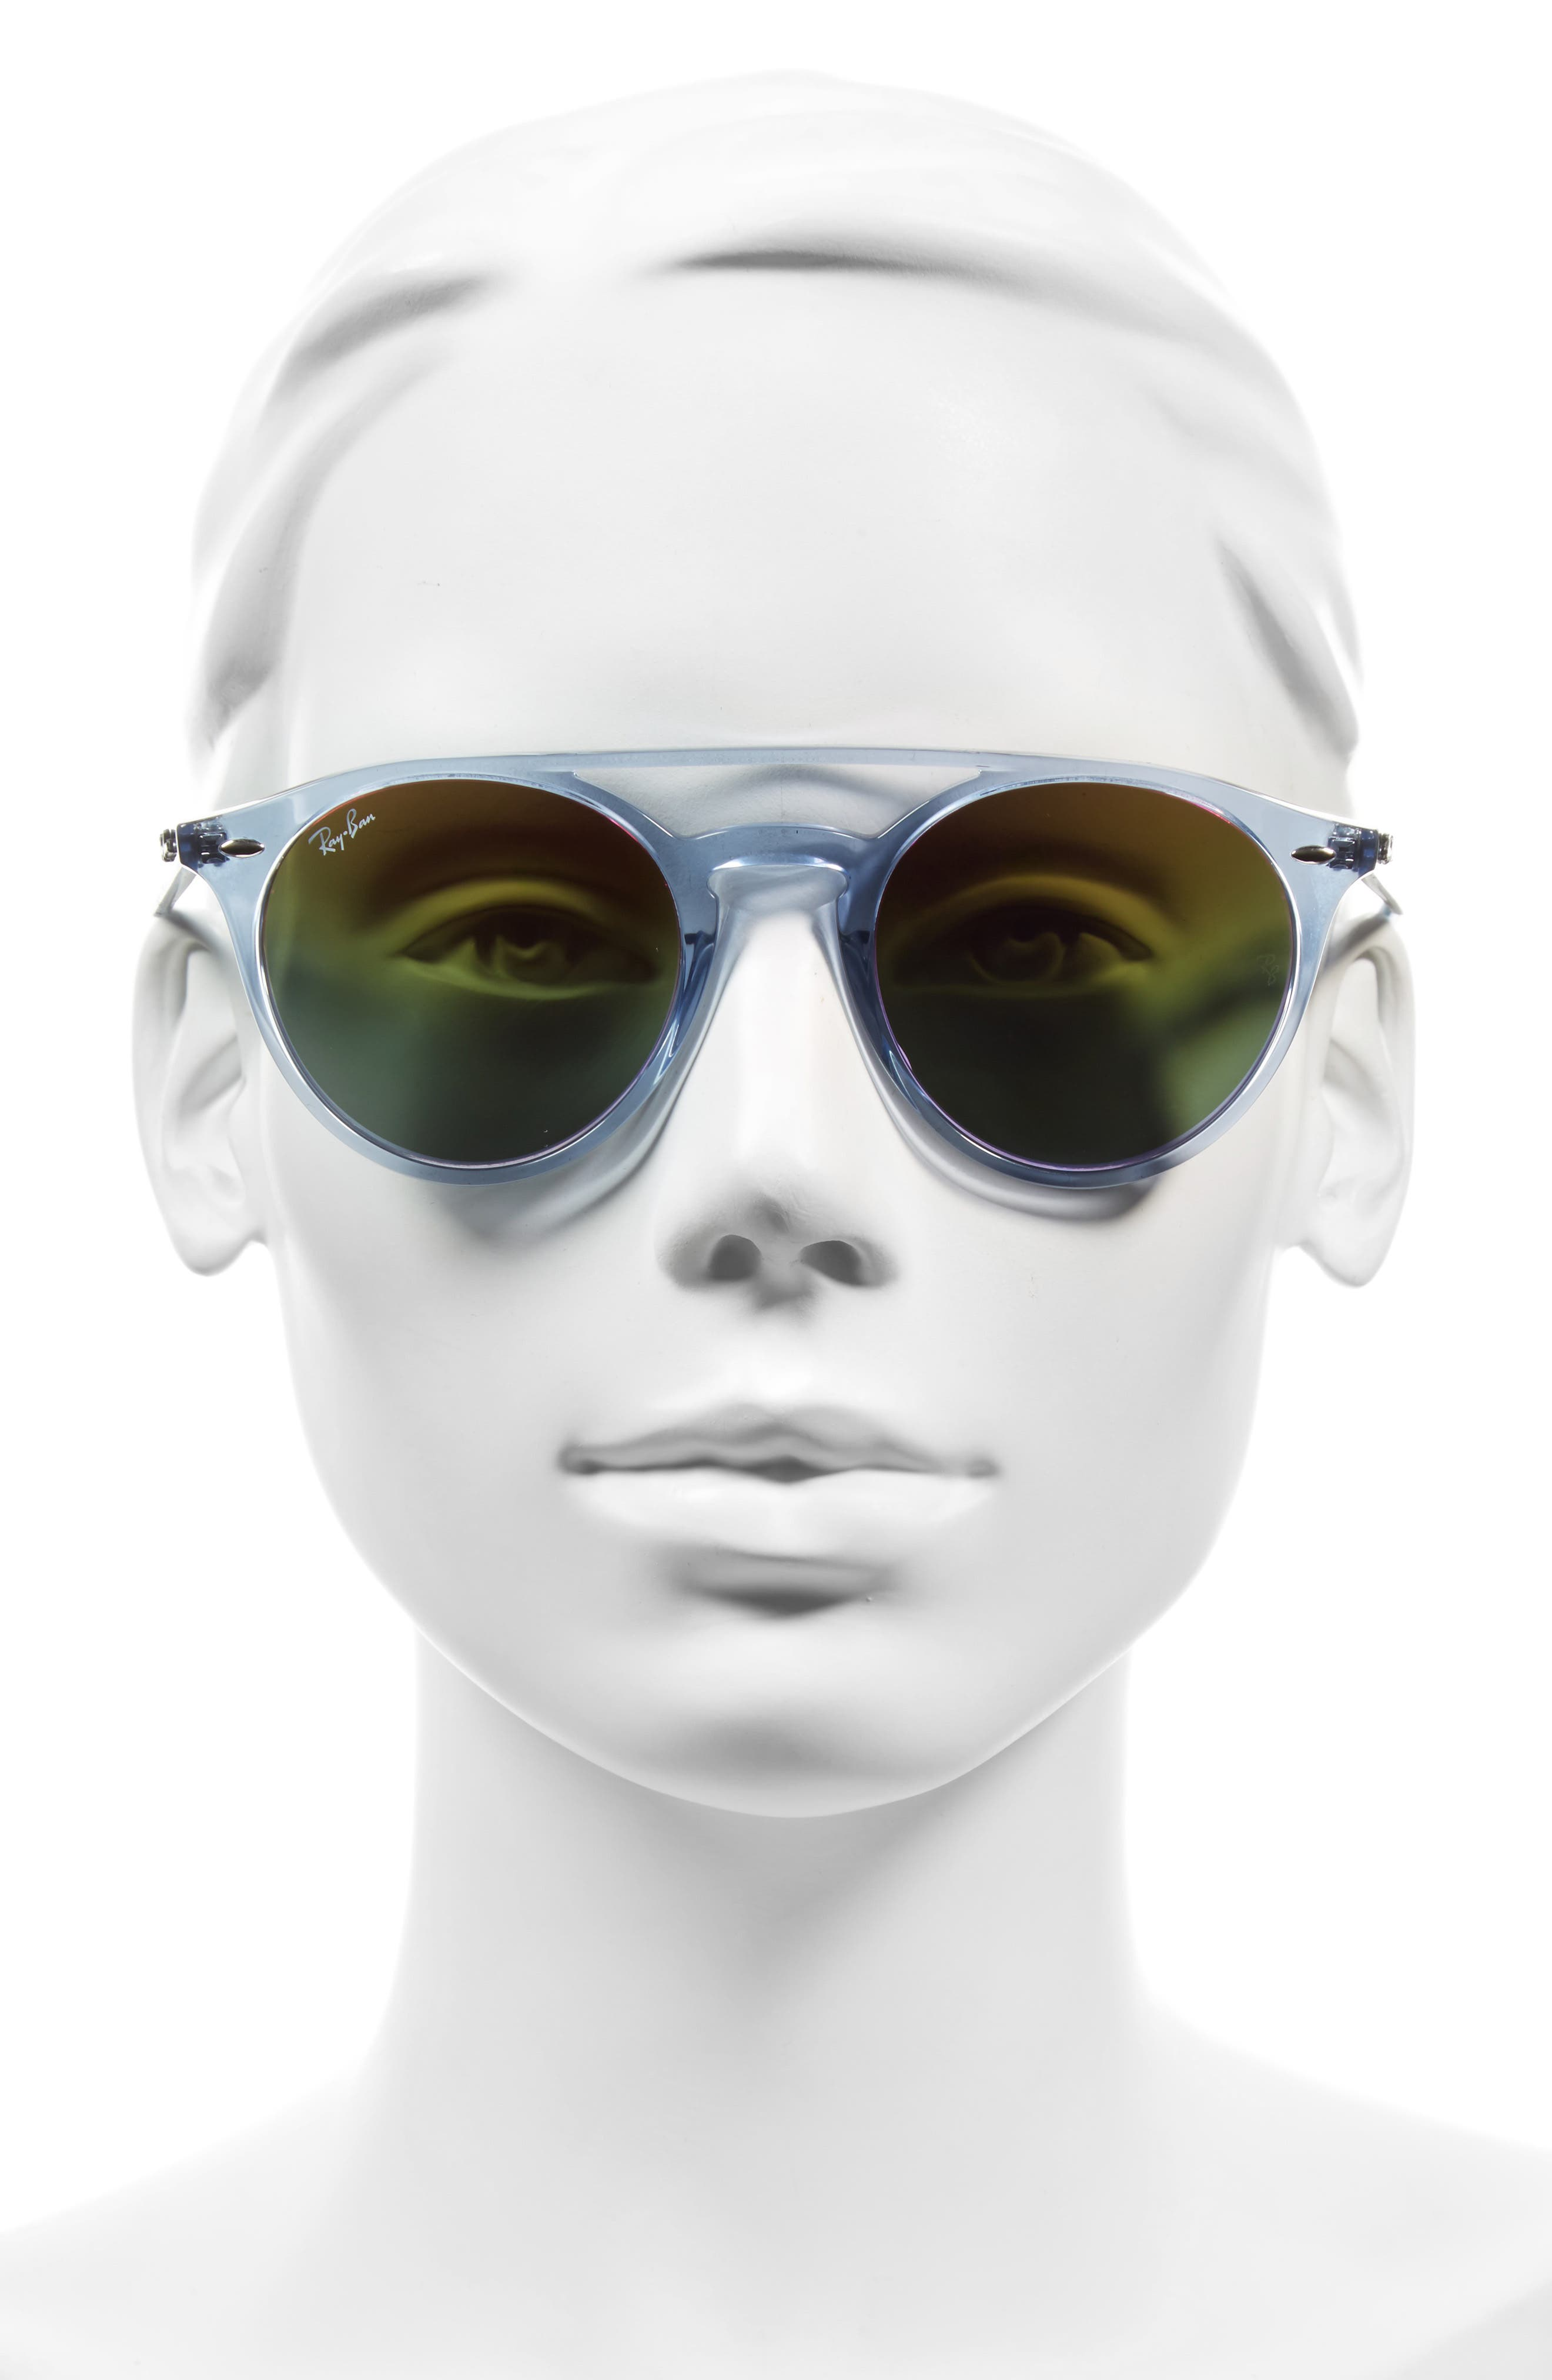 51mm Mirrored Rainbow Sunglasses,                             Alternate thumbnail 3, color,                             428